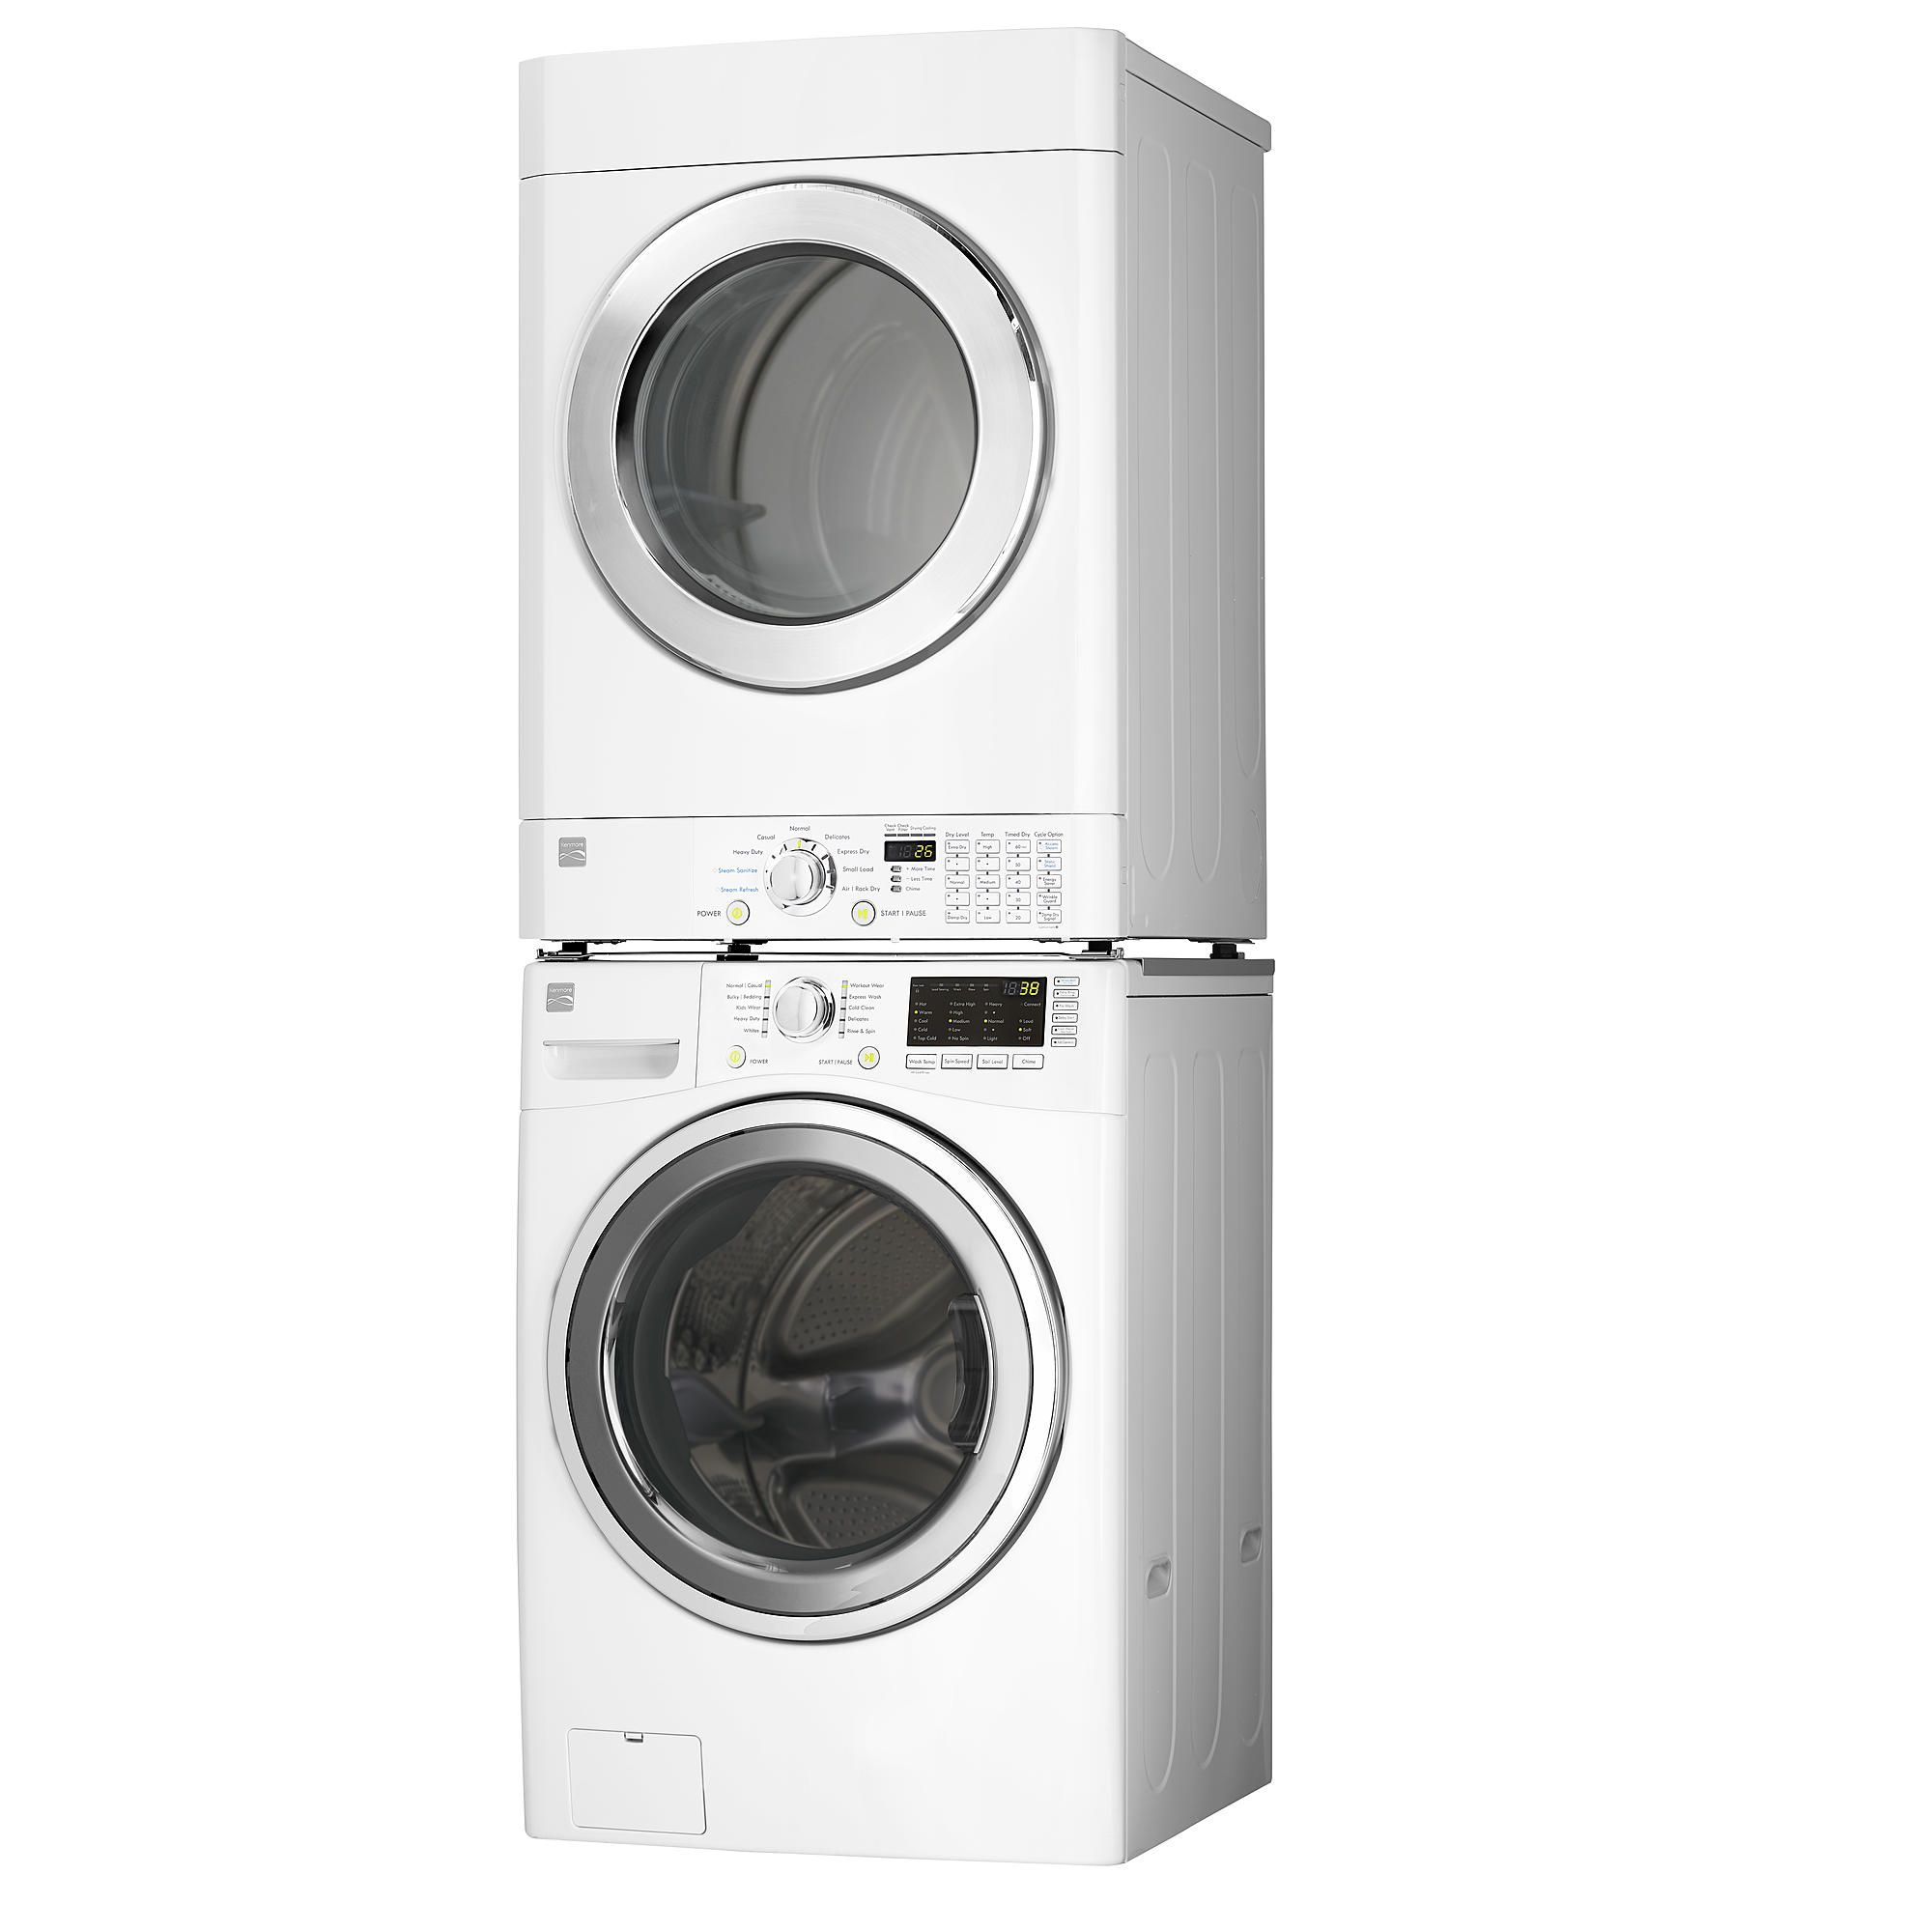 Appliances Dryers Kenmore 81392 73 Cu Ft Front Load Flip Control Electric Dryer